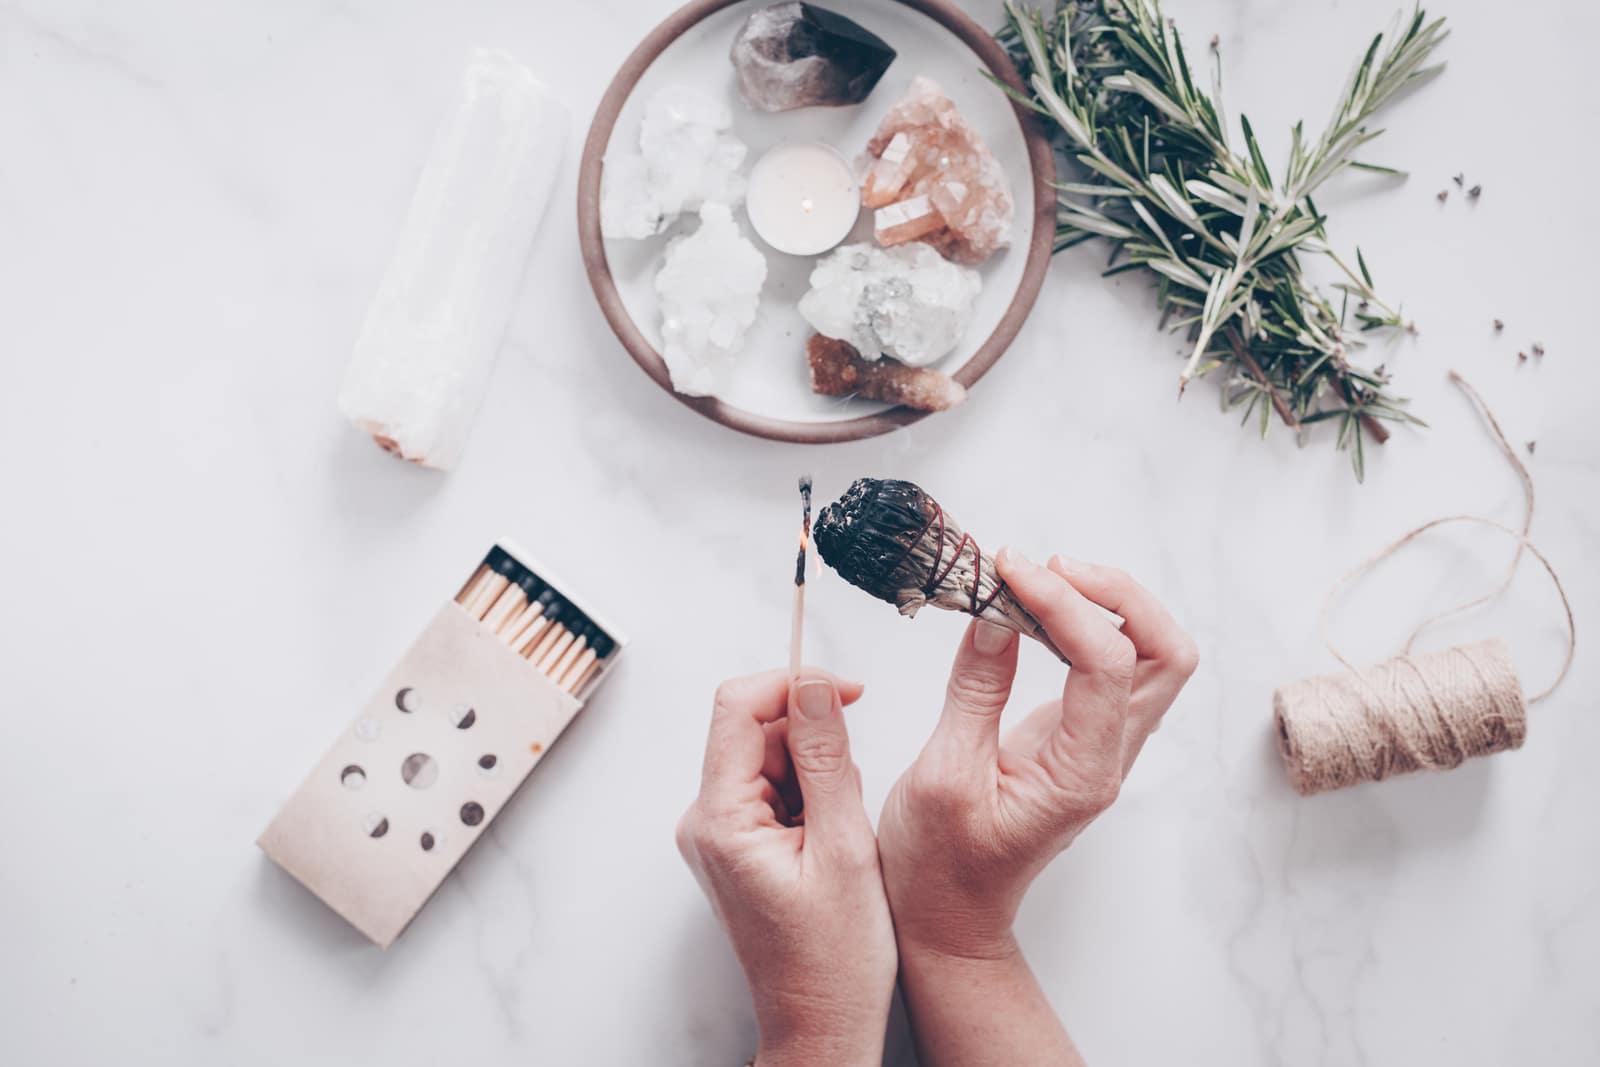 self-care ritual items